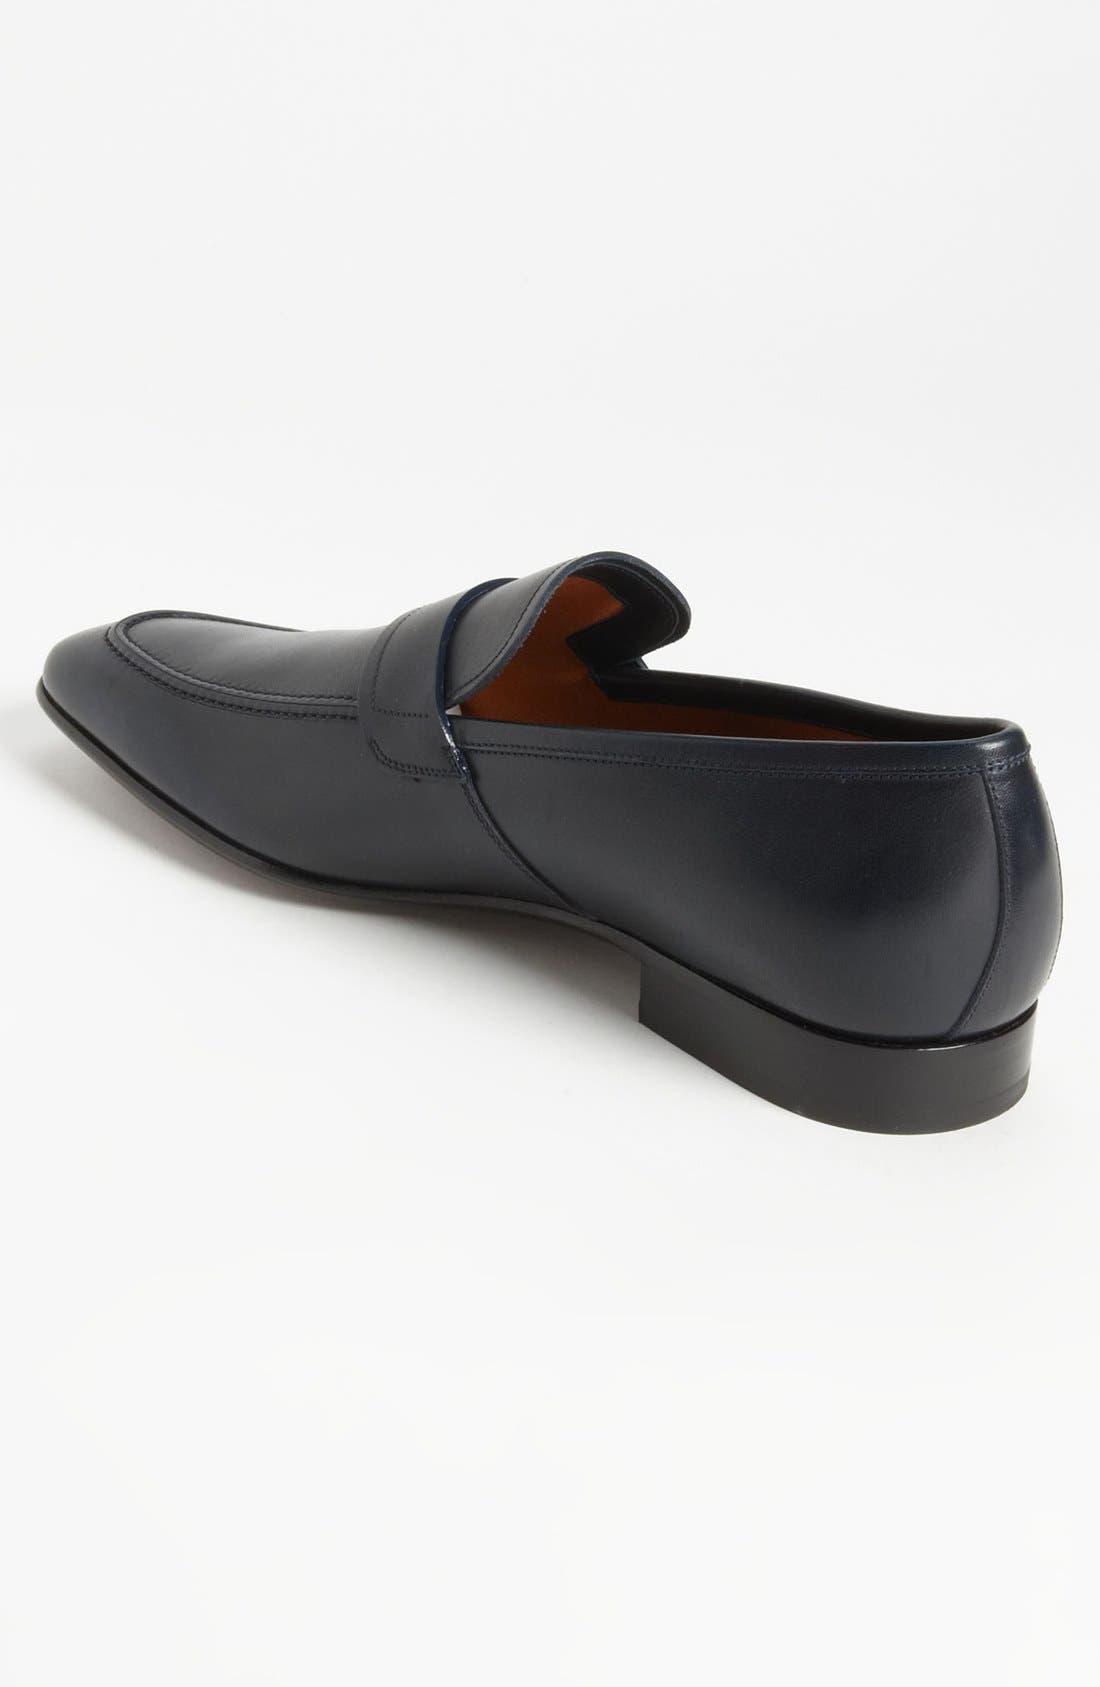 Alternate Image 2  - Salvatore Ferragamo 'Tribune' Loafer